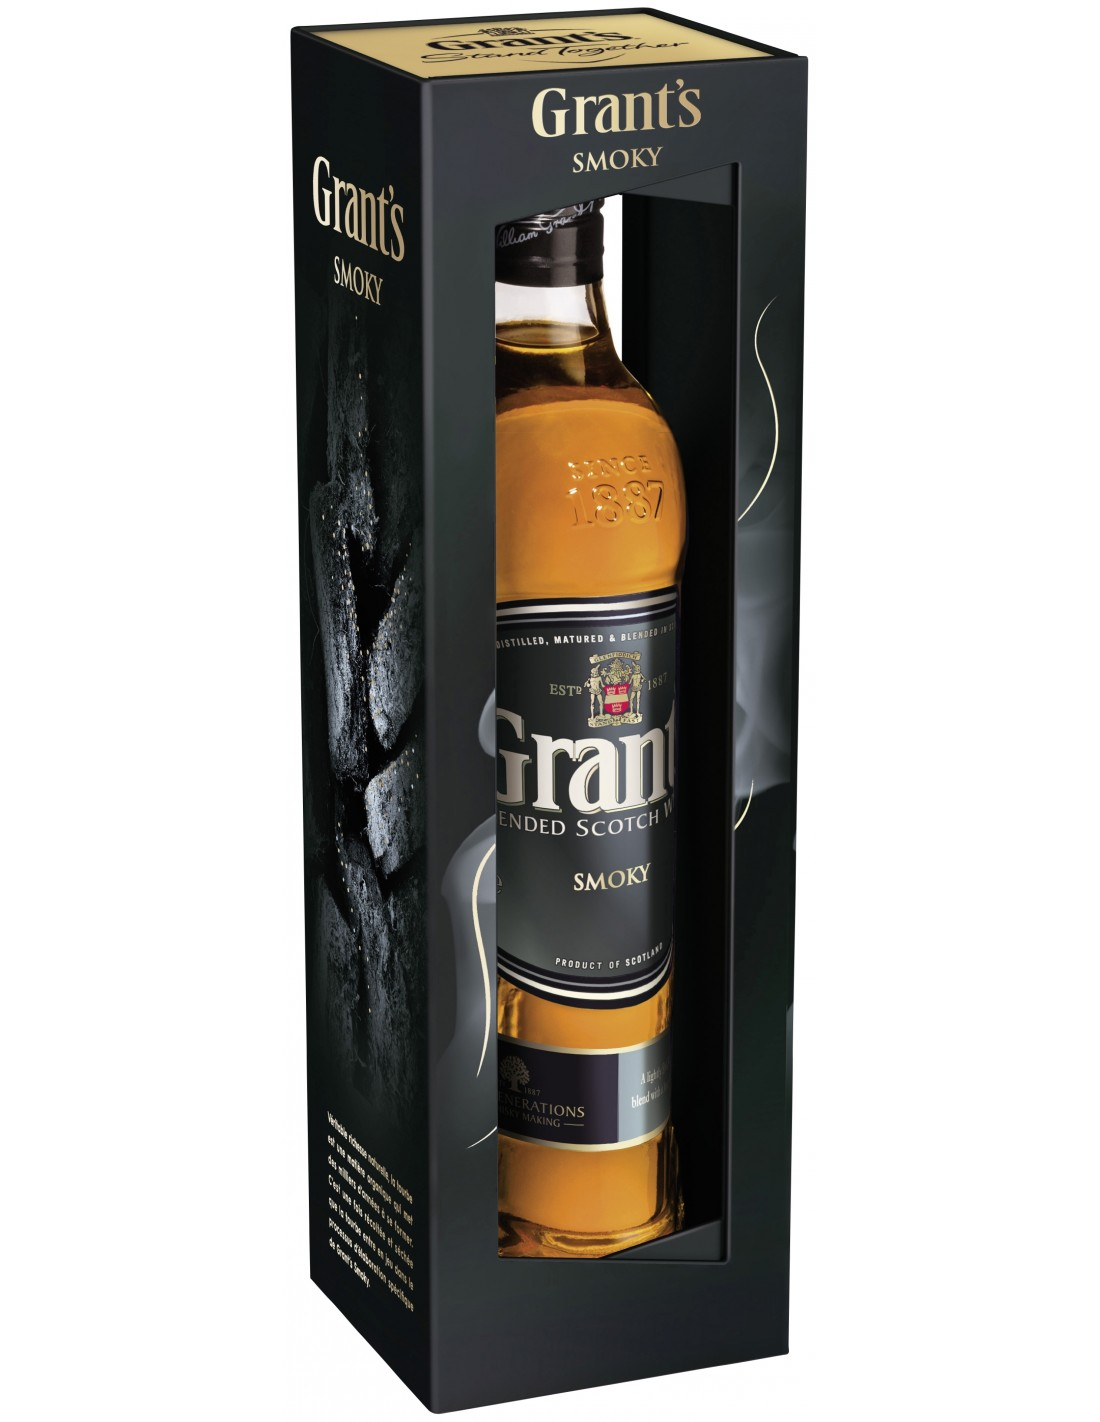 Whisky Grant's Smoky, 40% alc., 0.7L, Scotia